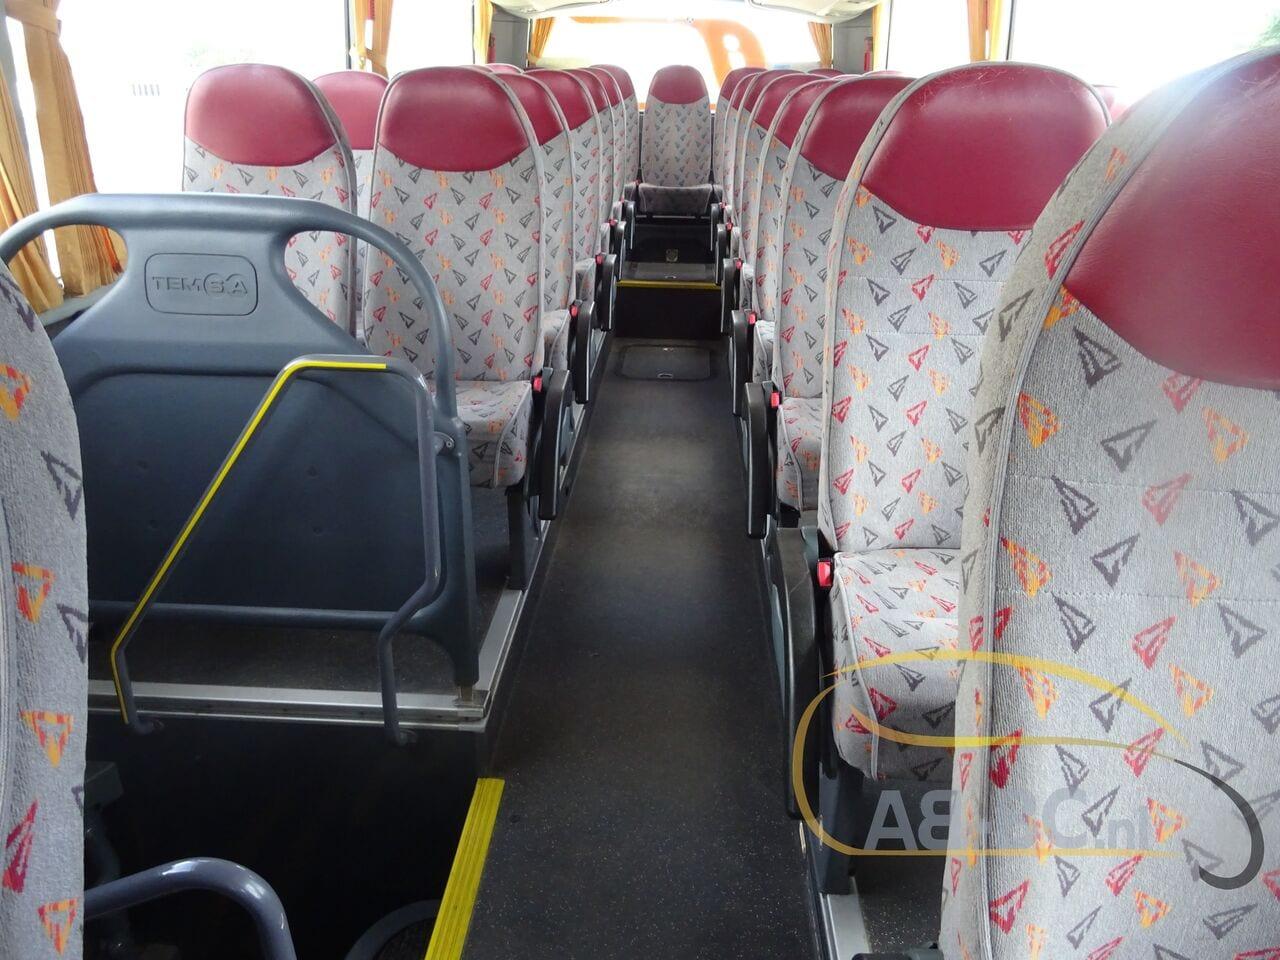 coach-busTEMSA-Safari-RD-DAF-Motor-53-Seats-Euro-5---1623932549209983464_big_4b4c66300286e5293b5af3ee2e7d6528--21061715155620919600